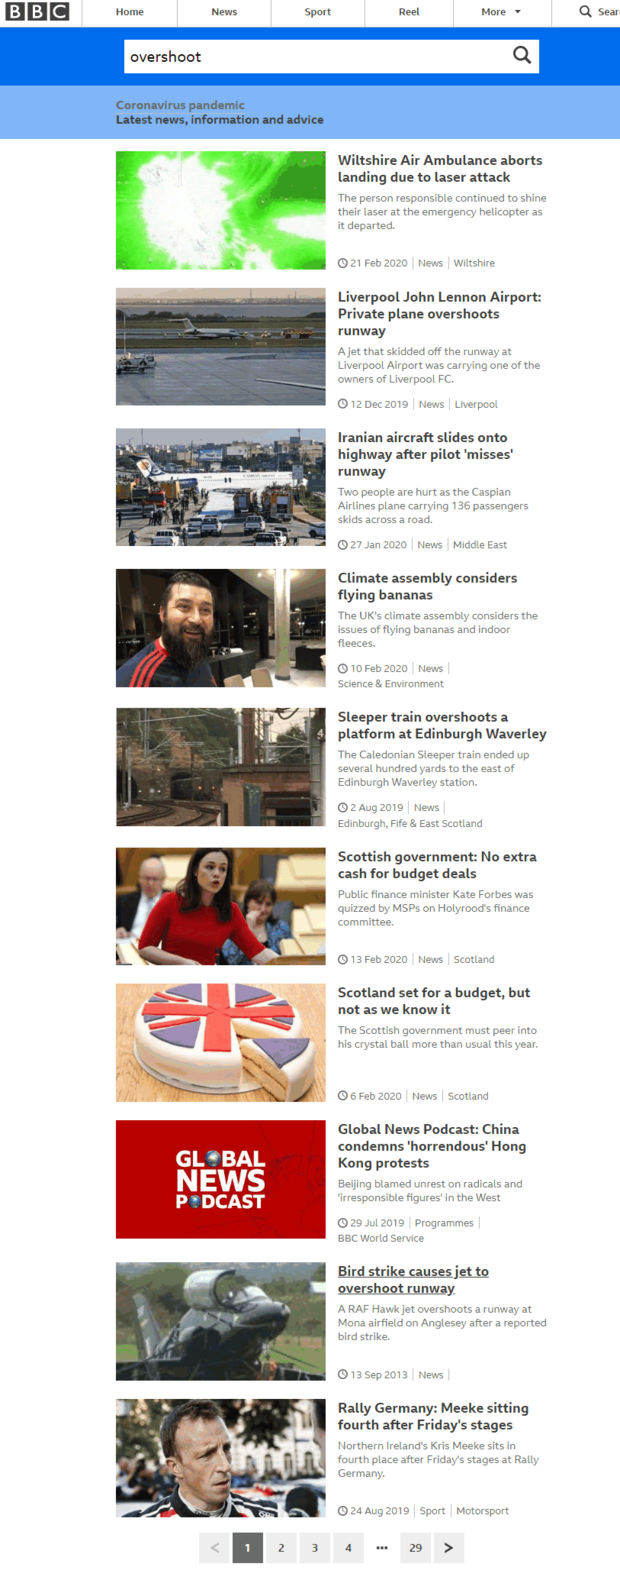 screenshot-www.bbc.co.uk-2020.03.20-07_12_54.png